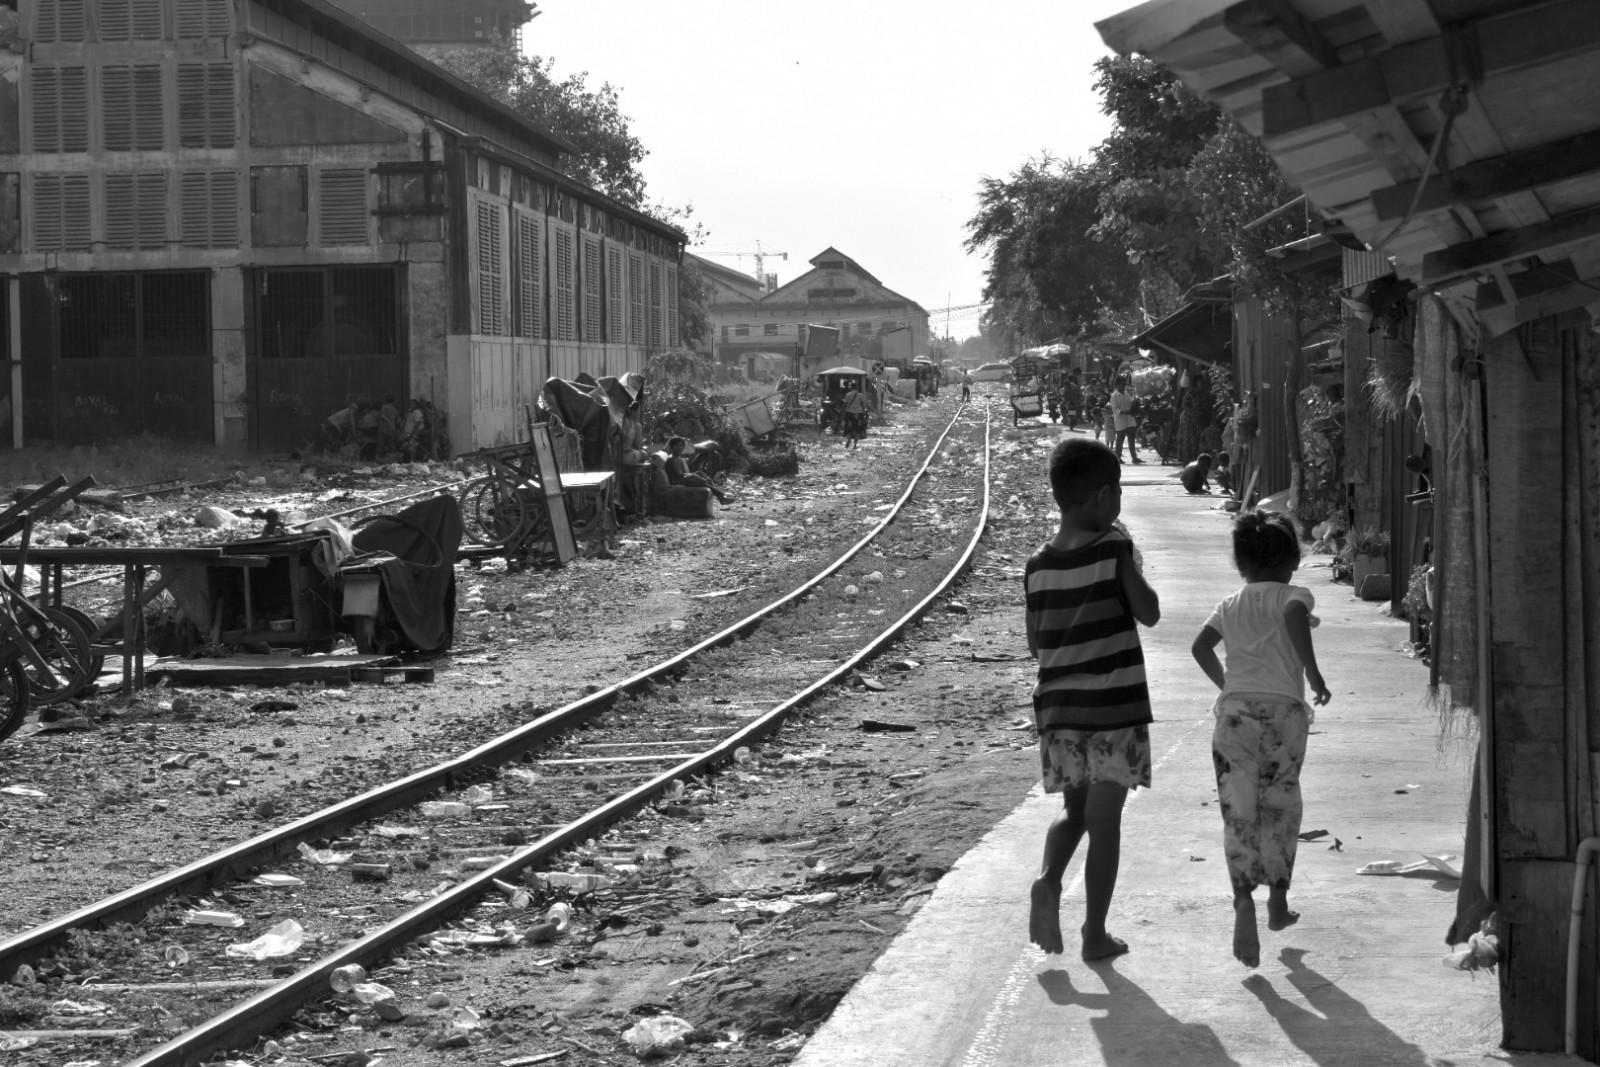 City of garbage Phnom Penh railroad tracks children playing